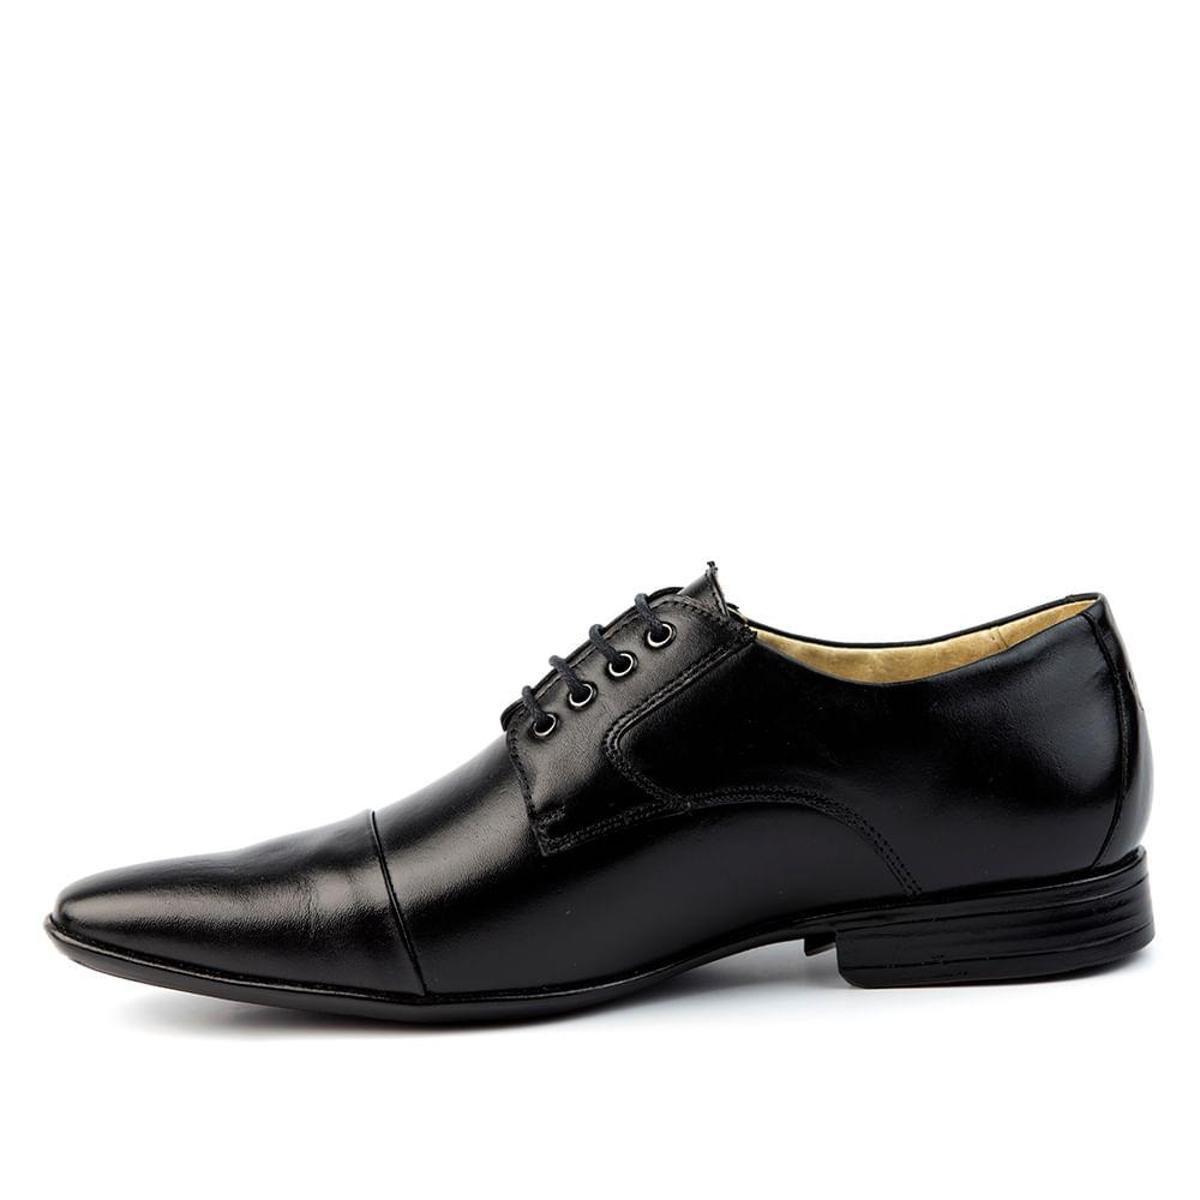 Shoes Social Doctor Preto Masculino 3047 Sapato Jade em Couro BAWn0wn1qd